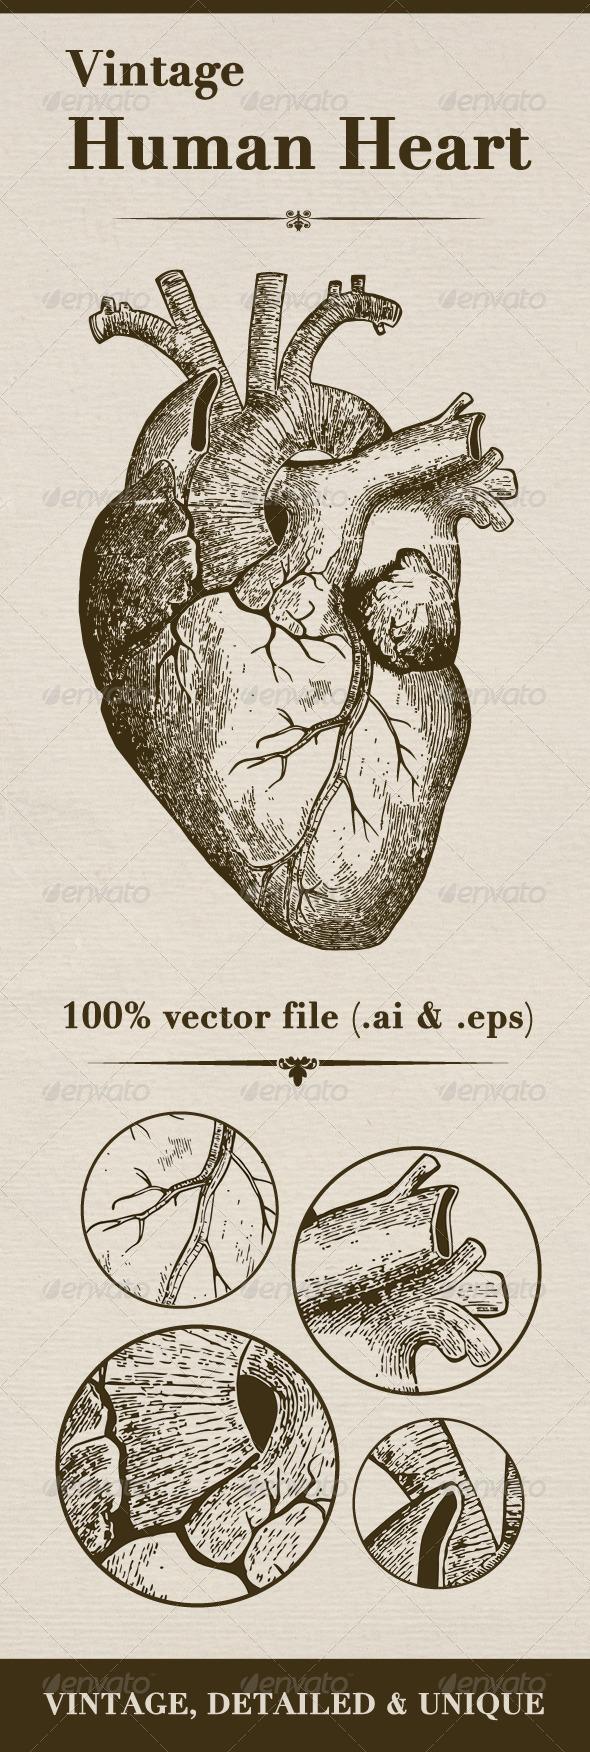 Vintage Human Heart - Objects Vectors